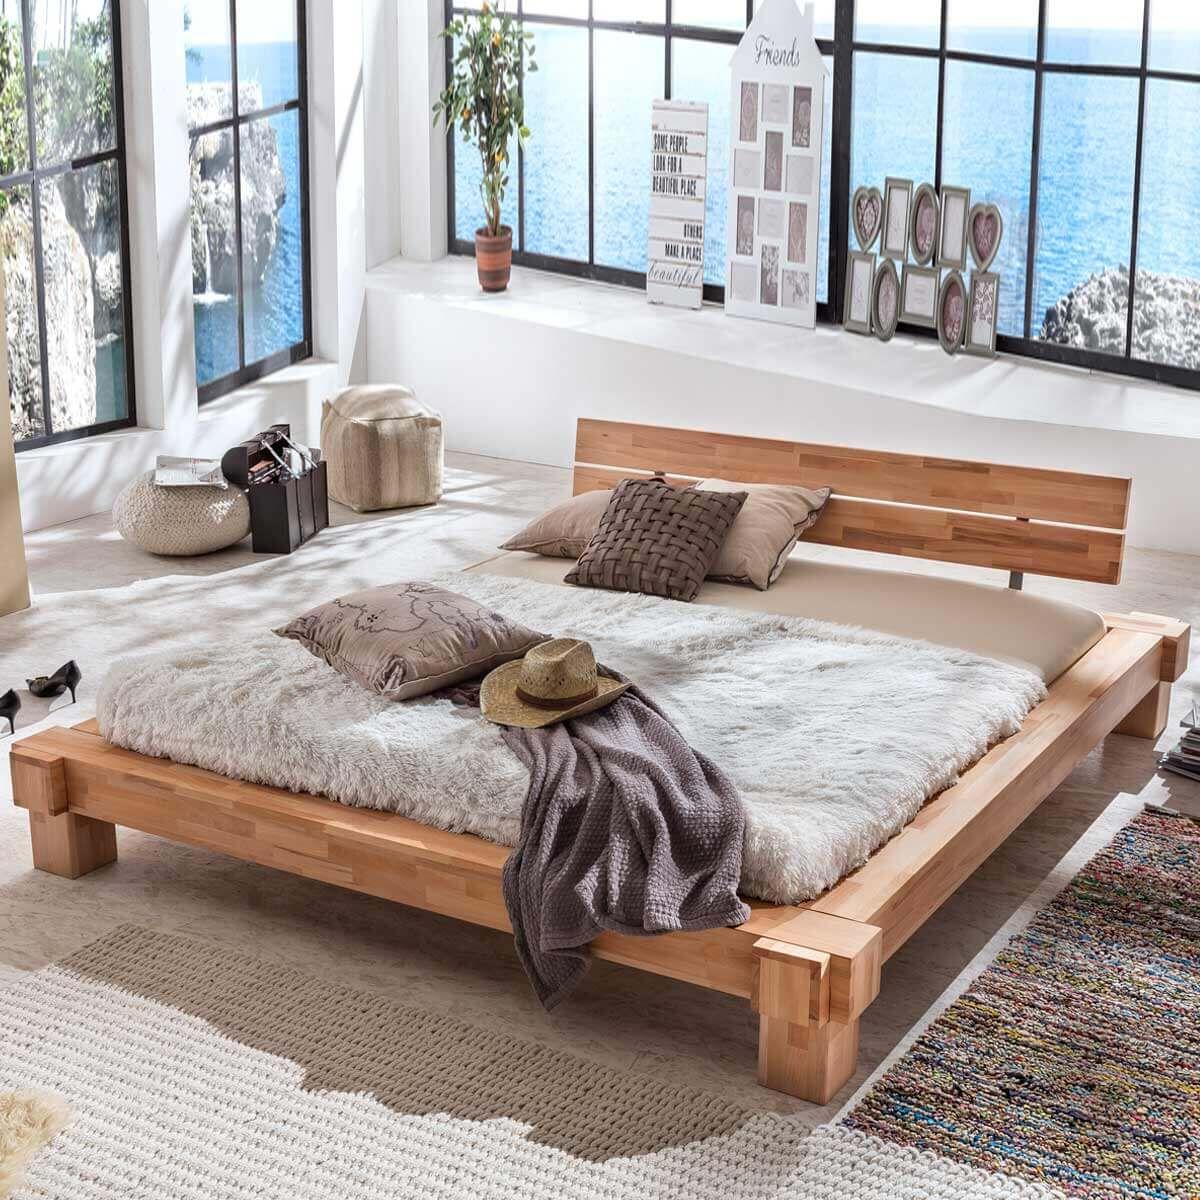 Bett Kopervik 140x200 In Kernbuche Massiv Geölt MÖbel Ideal Build Outdoor Furniture Pallet Furniture Outdoor Bed